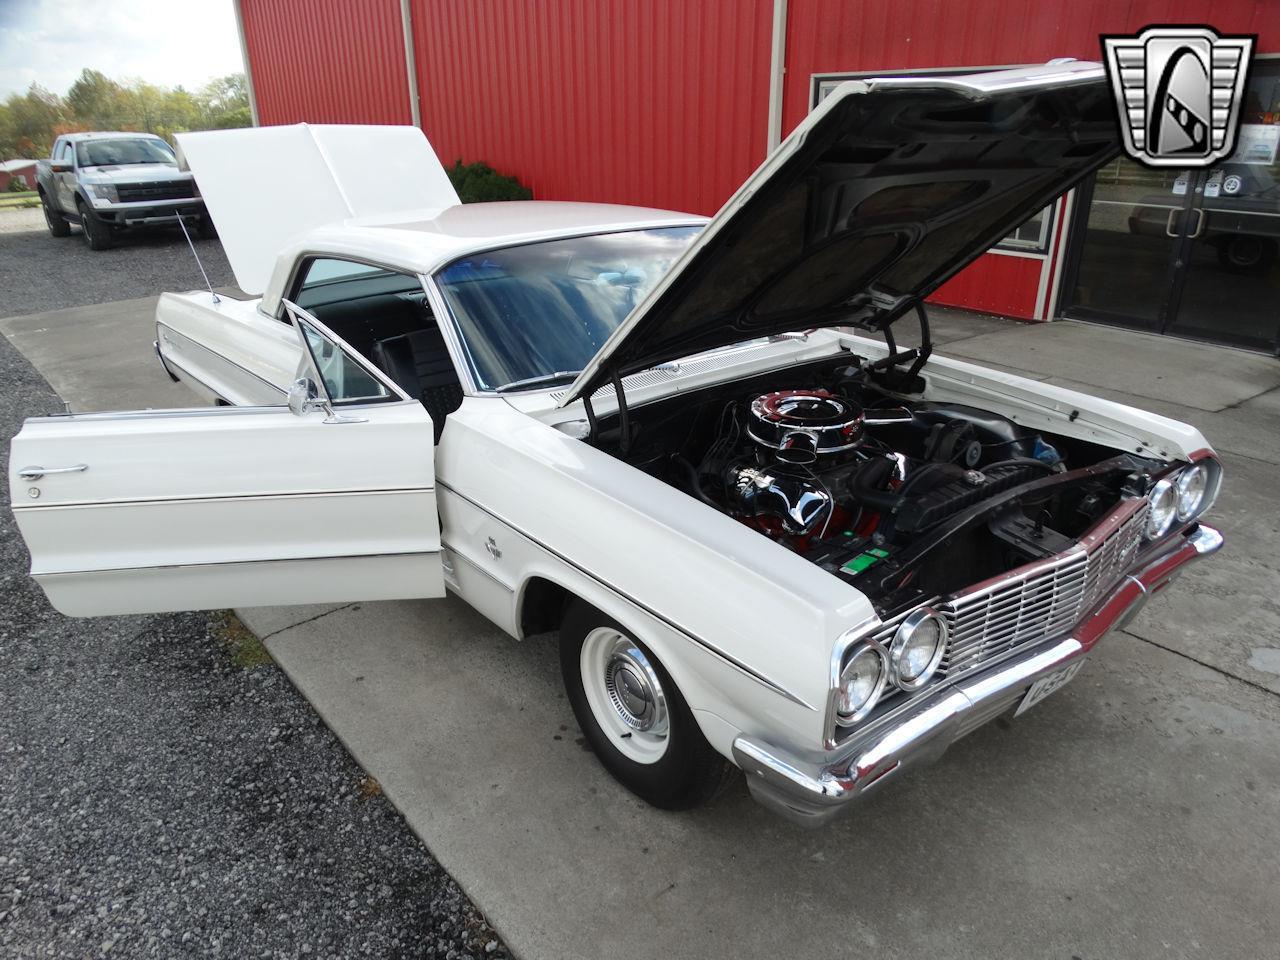 1964 Chevrolet Impala (CC-1416986) for sale in O'Fallon, Illinois